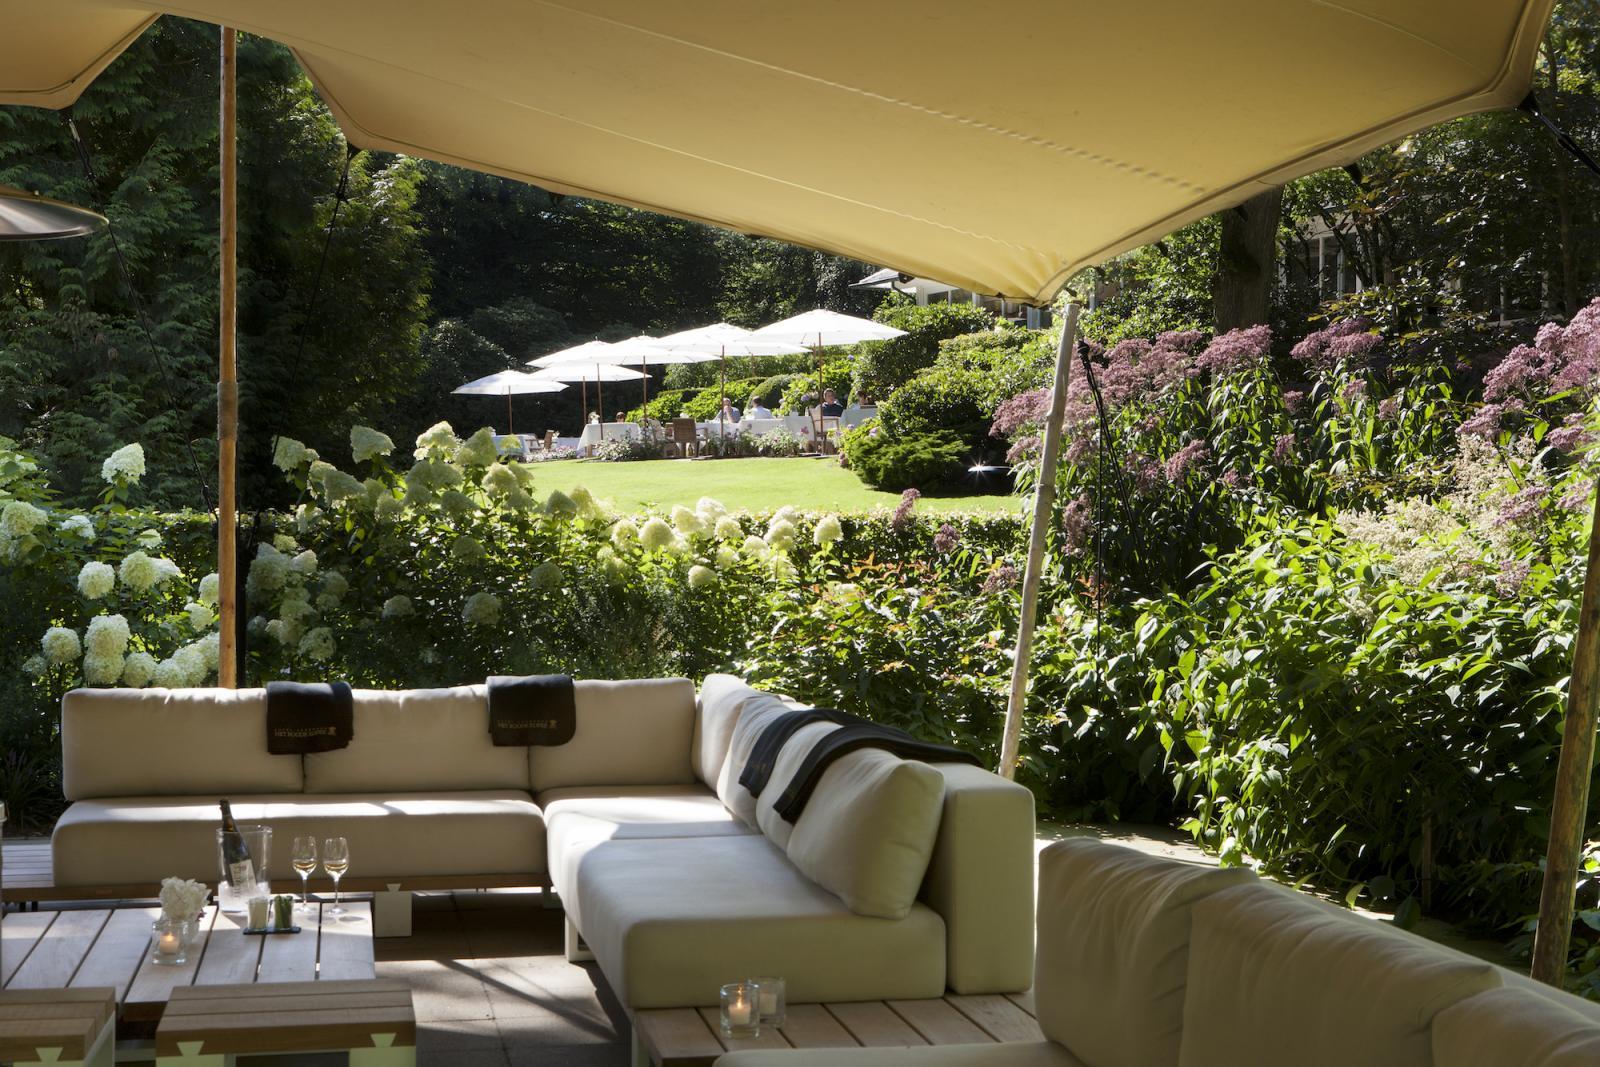 Dinner Set Tuin : Luxushotel landgut het roode koper leuvenum inspirieren